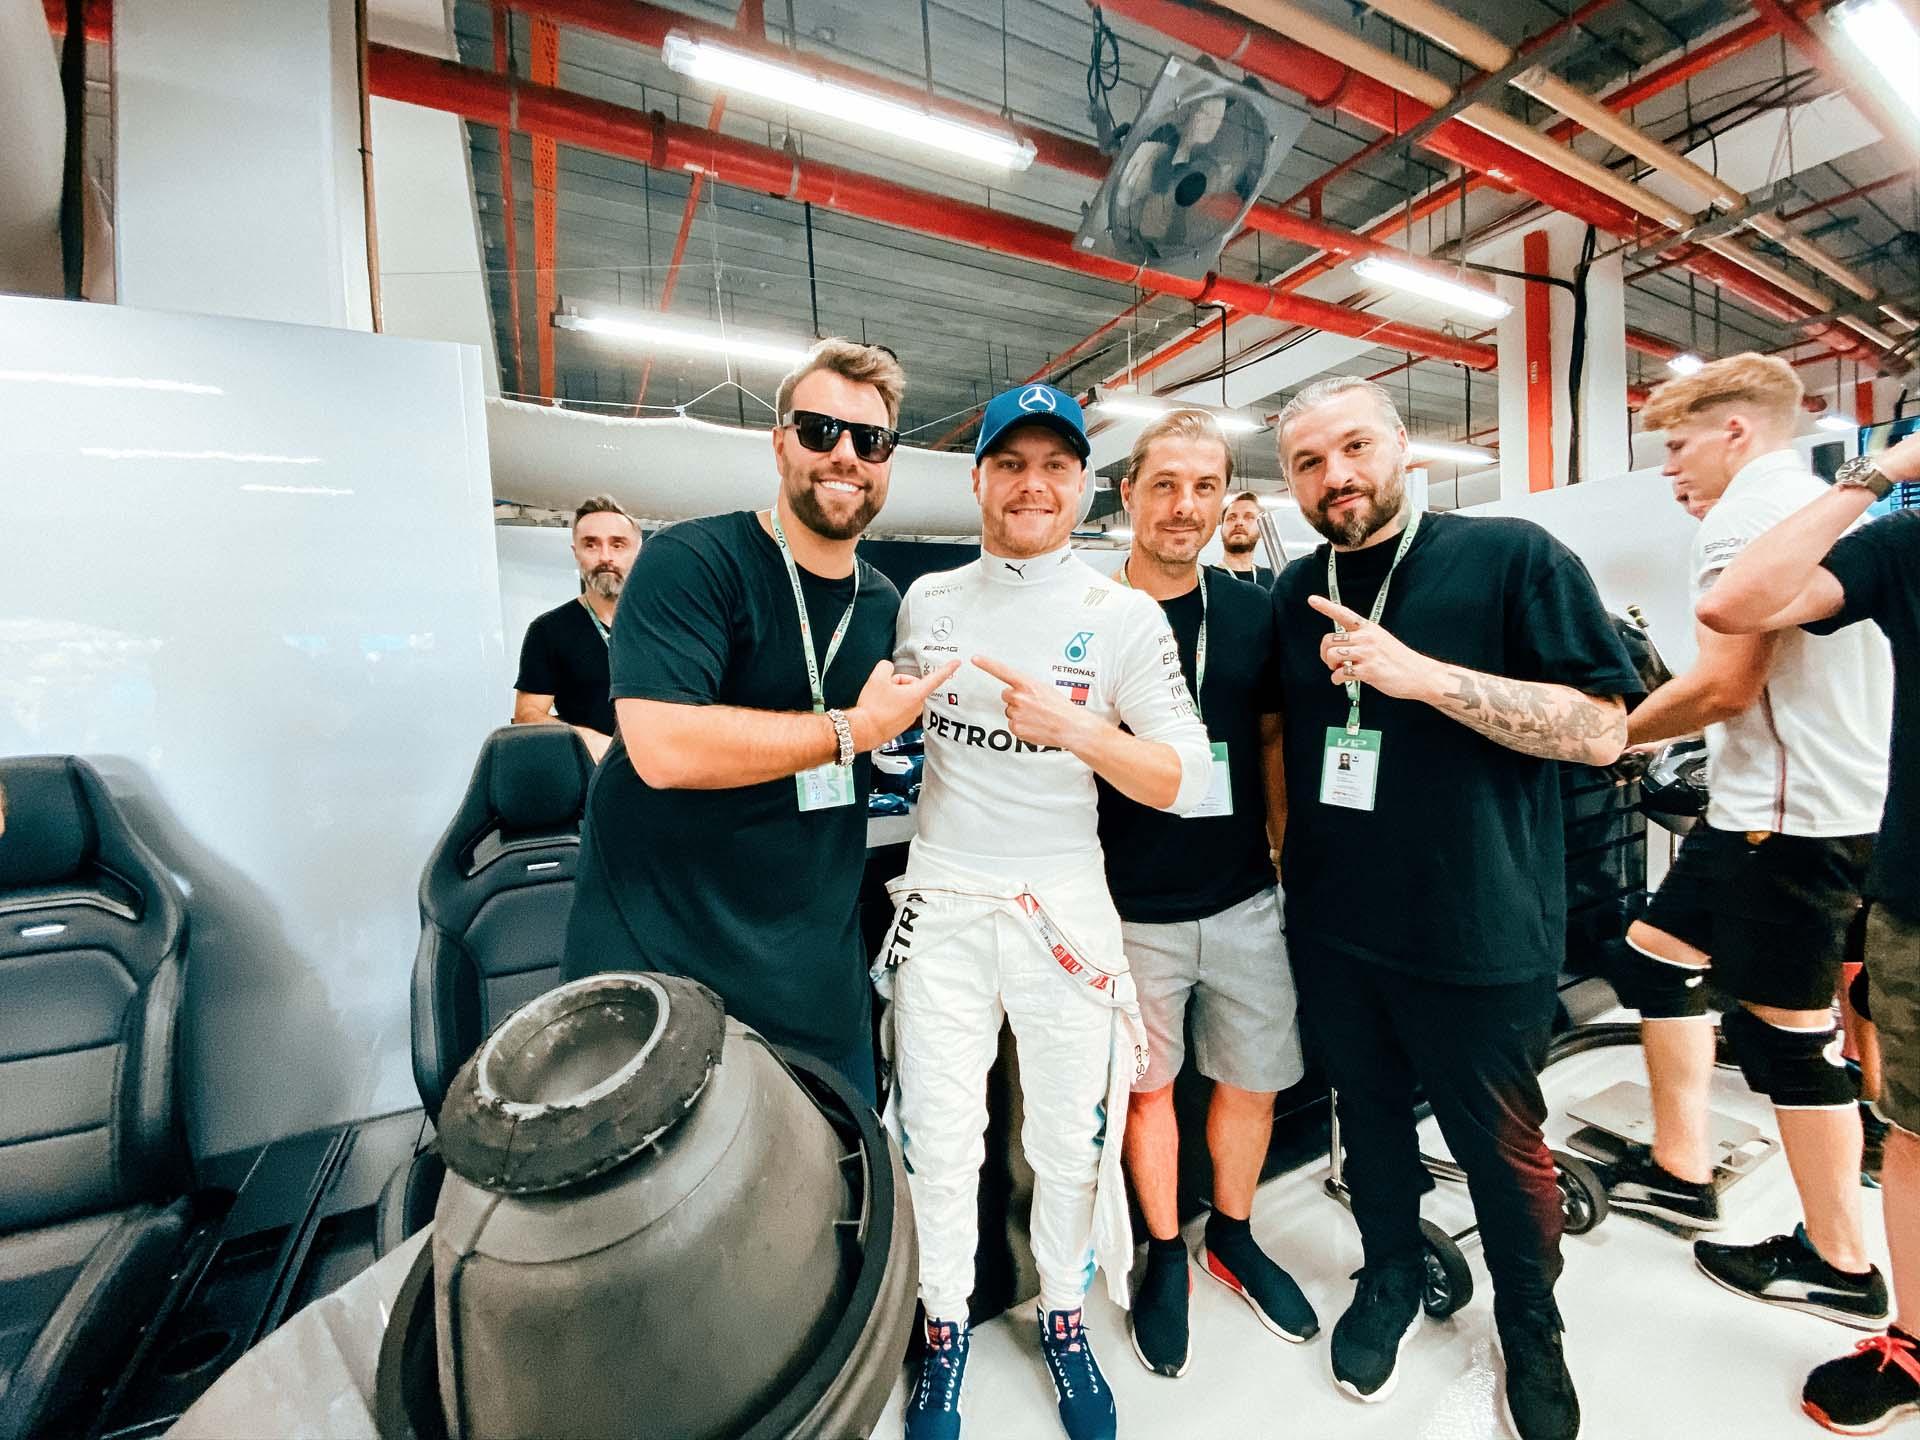 2019 Singapore Grand Prix, Friday - Paul Ripke